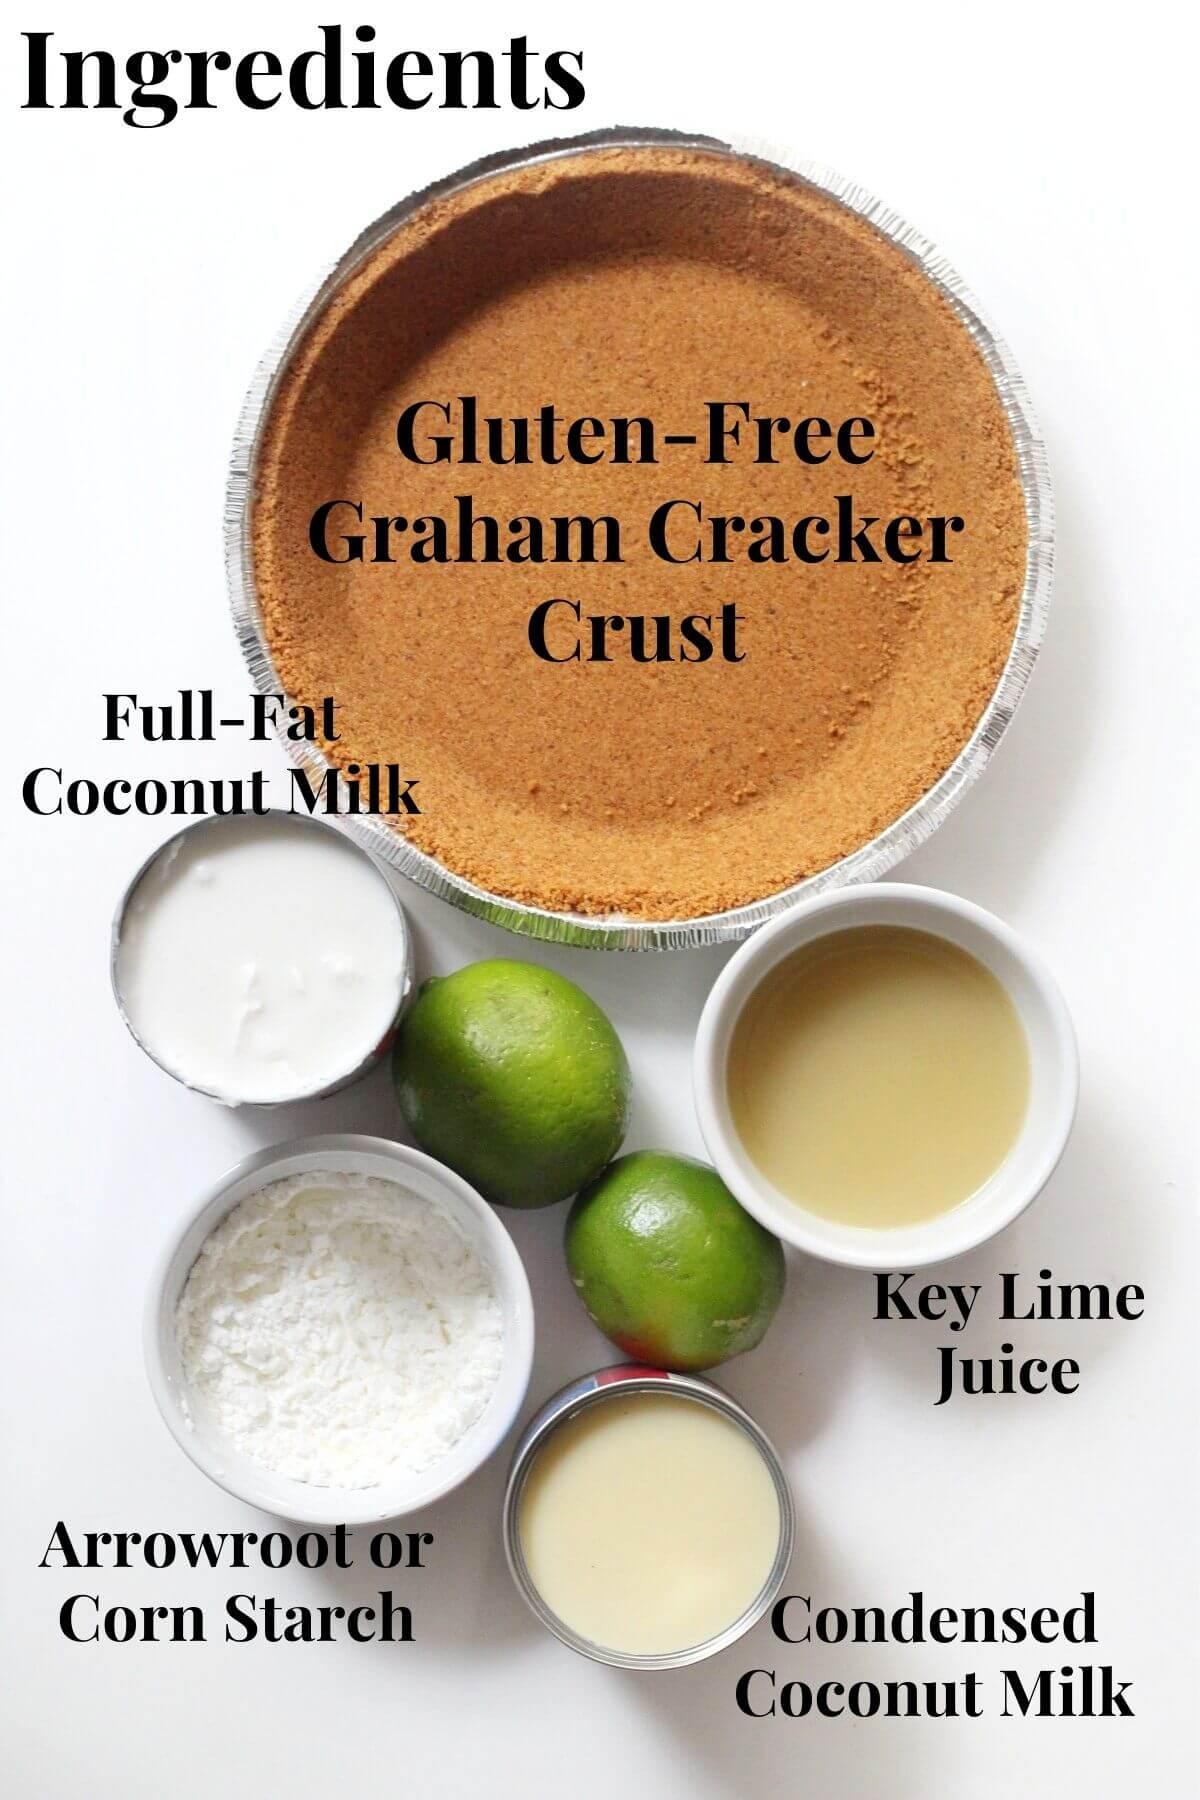 vegan and gluten-free key lime pie ingredients